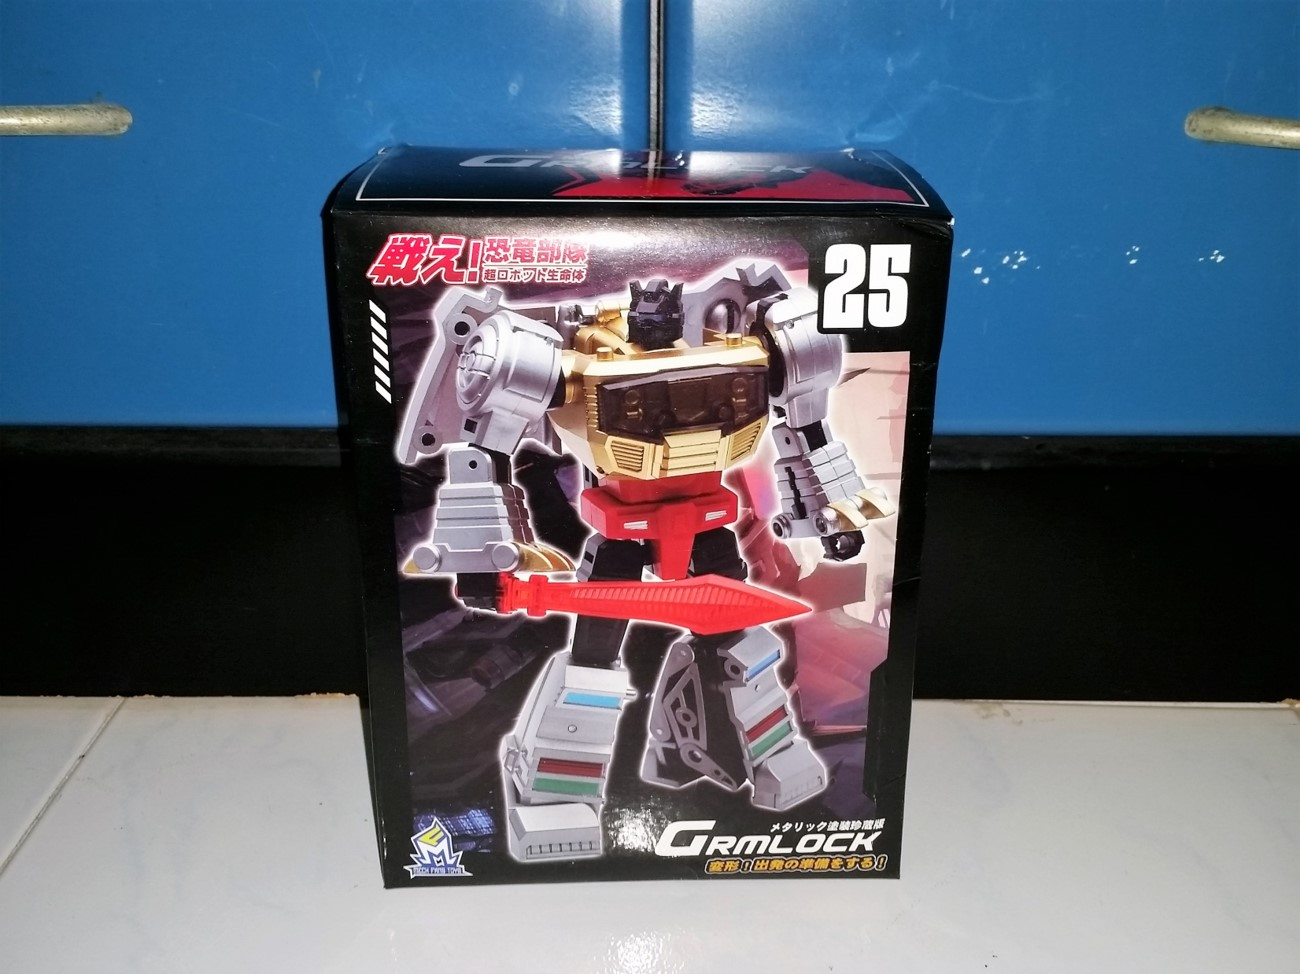 New Transform Robot Toy MFT MF 25 Grmlock mini G1 Grimlock